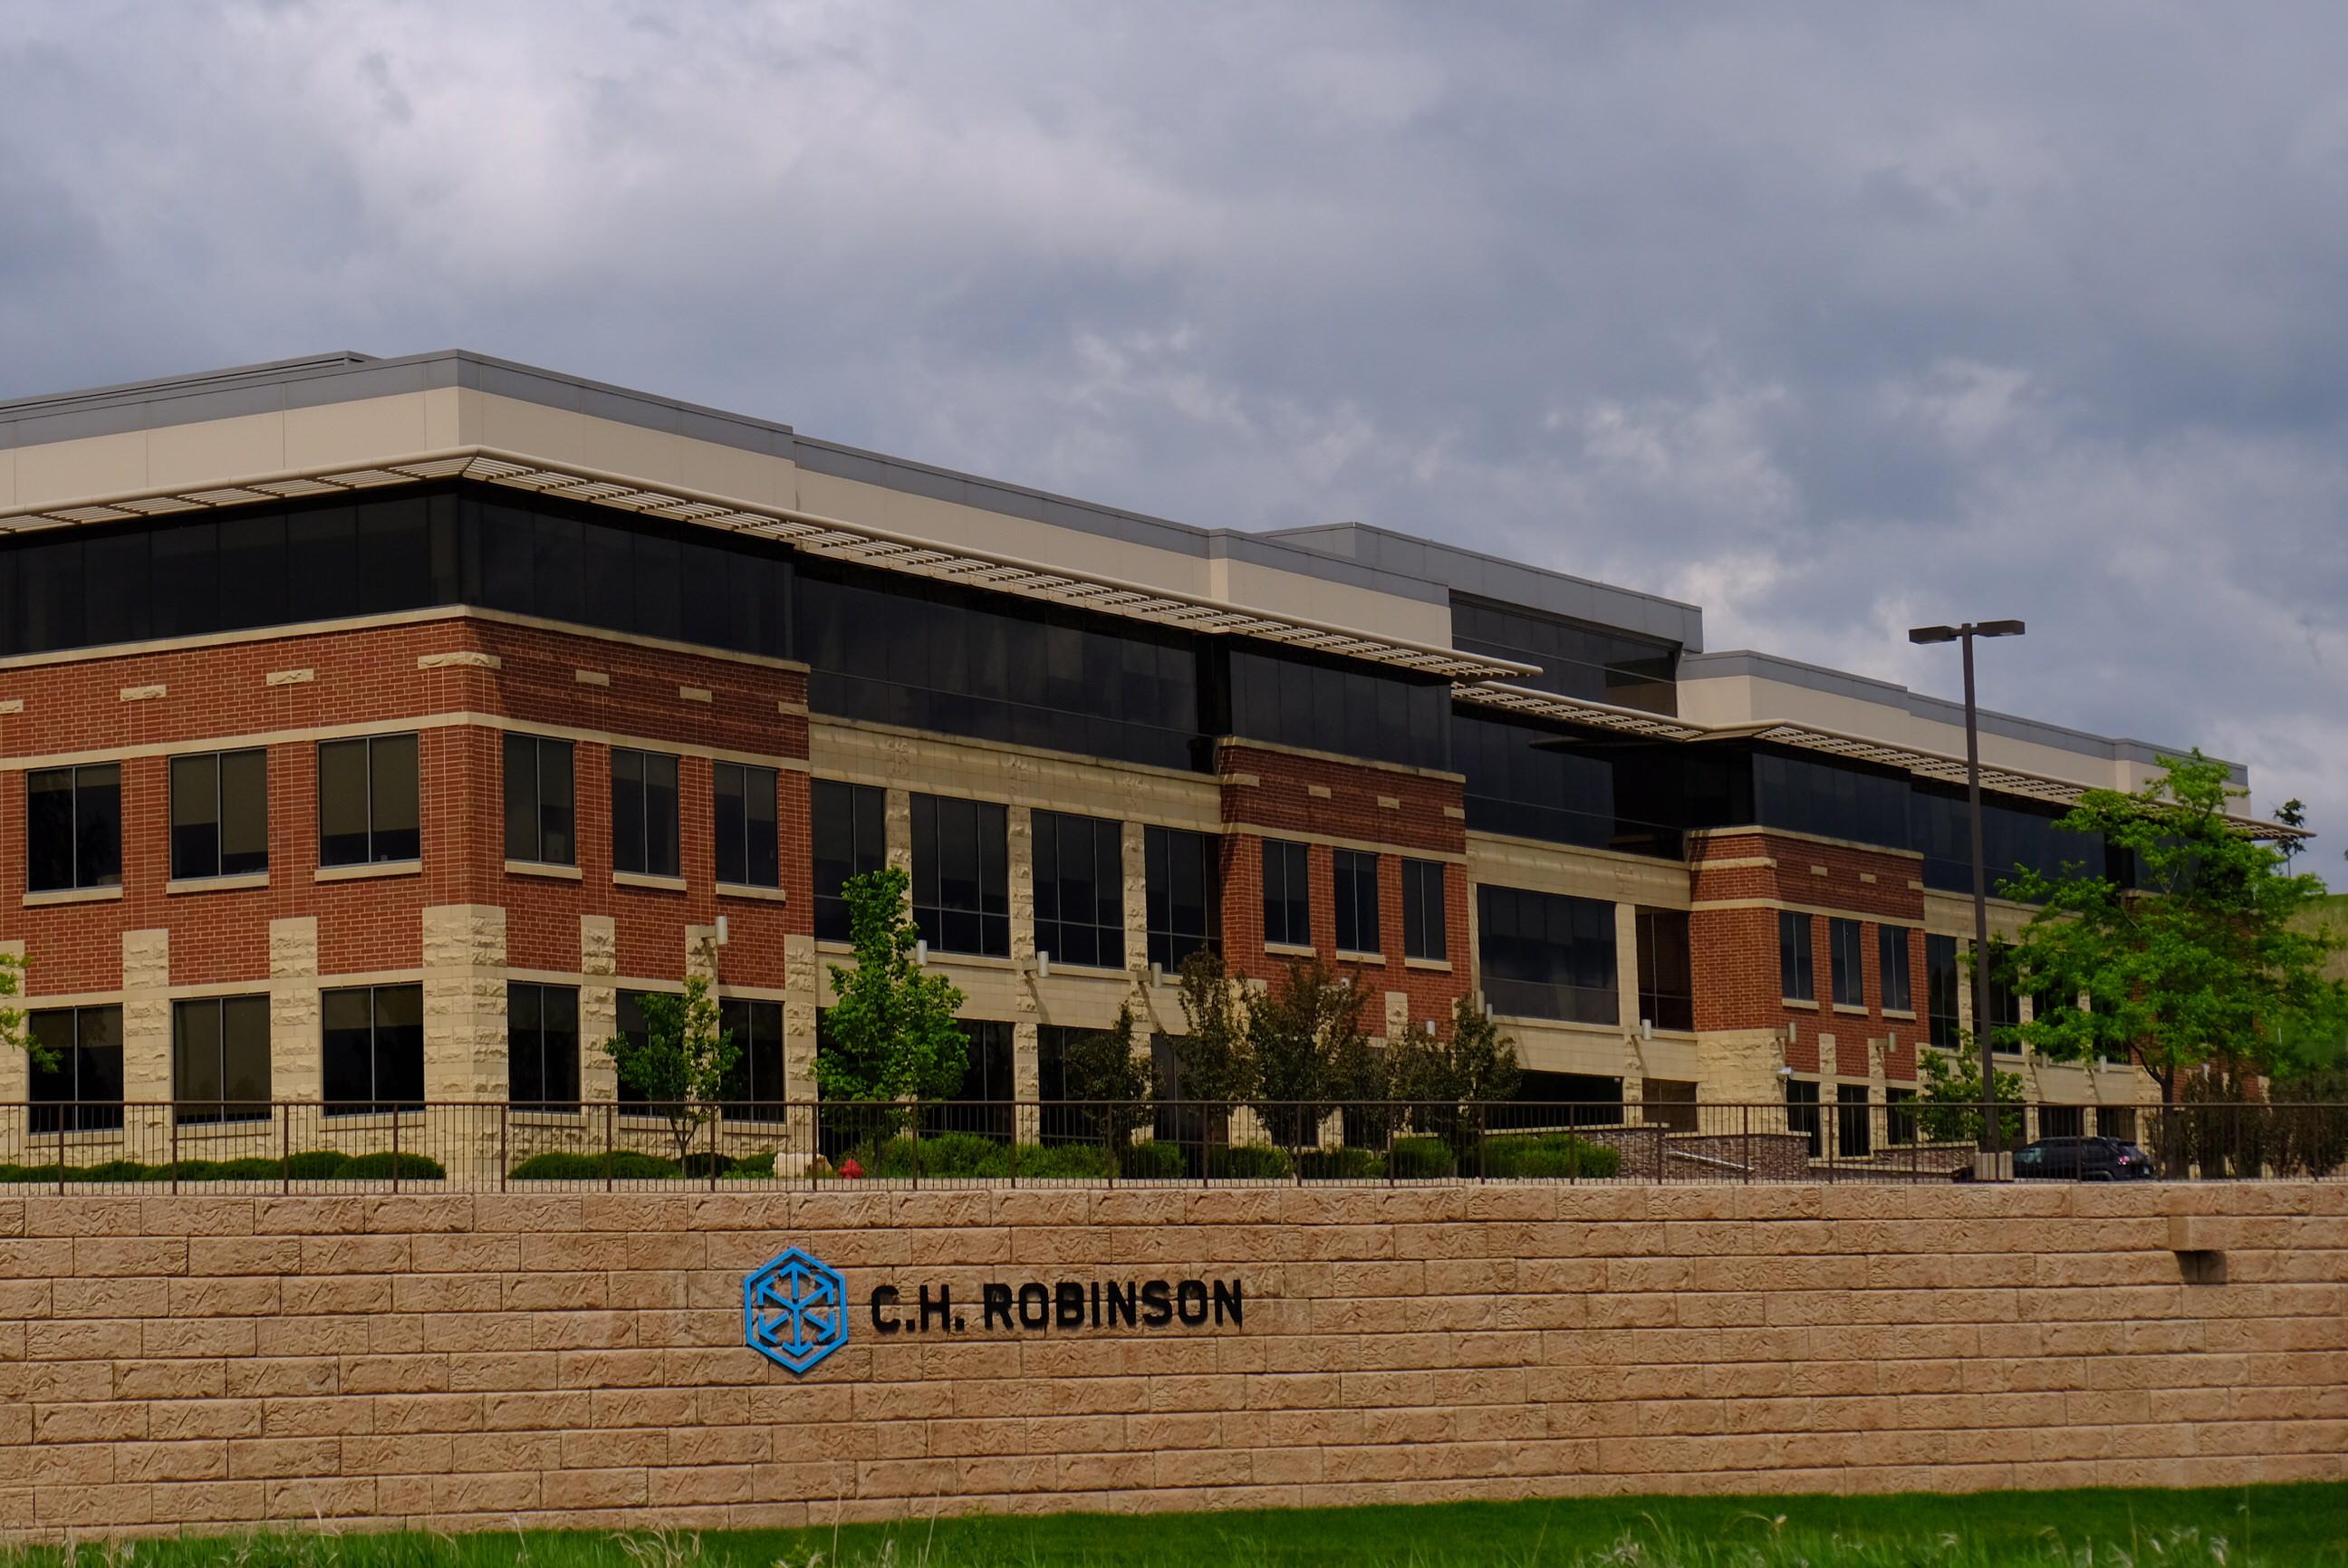 C.H. Robinson's corporate headquarters in Eden Prairie, Minnesota.